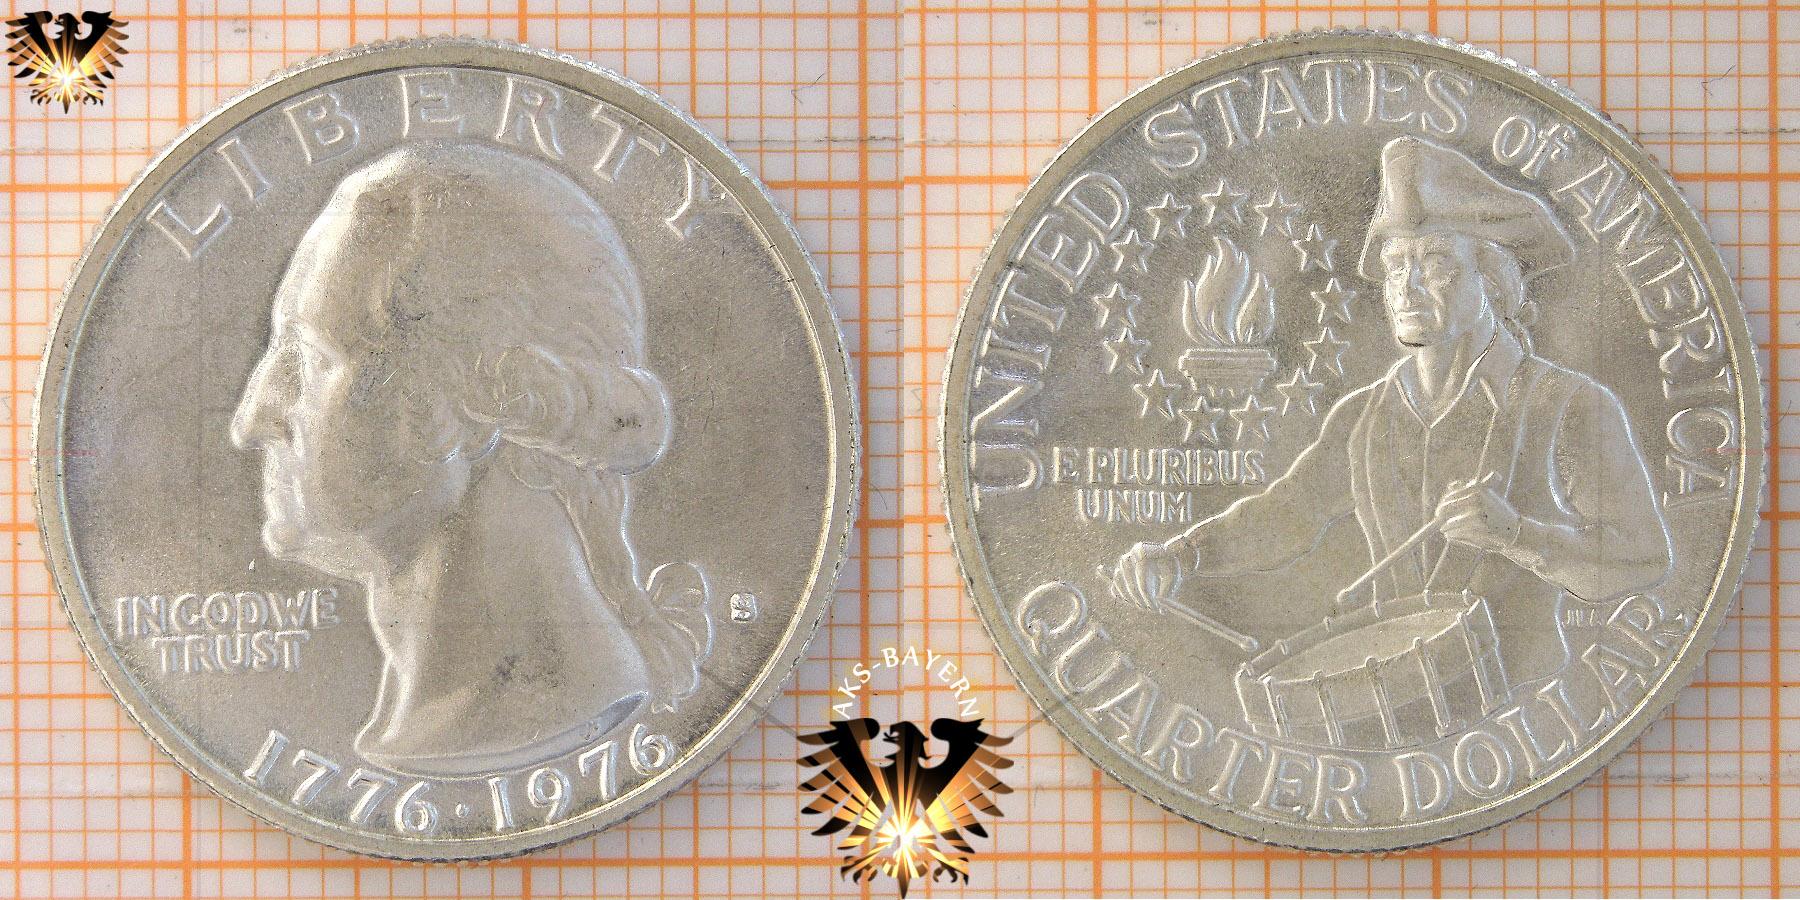 25 Cents 1 Quarter Dollar Usa 1976 Drummer Boy